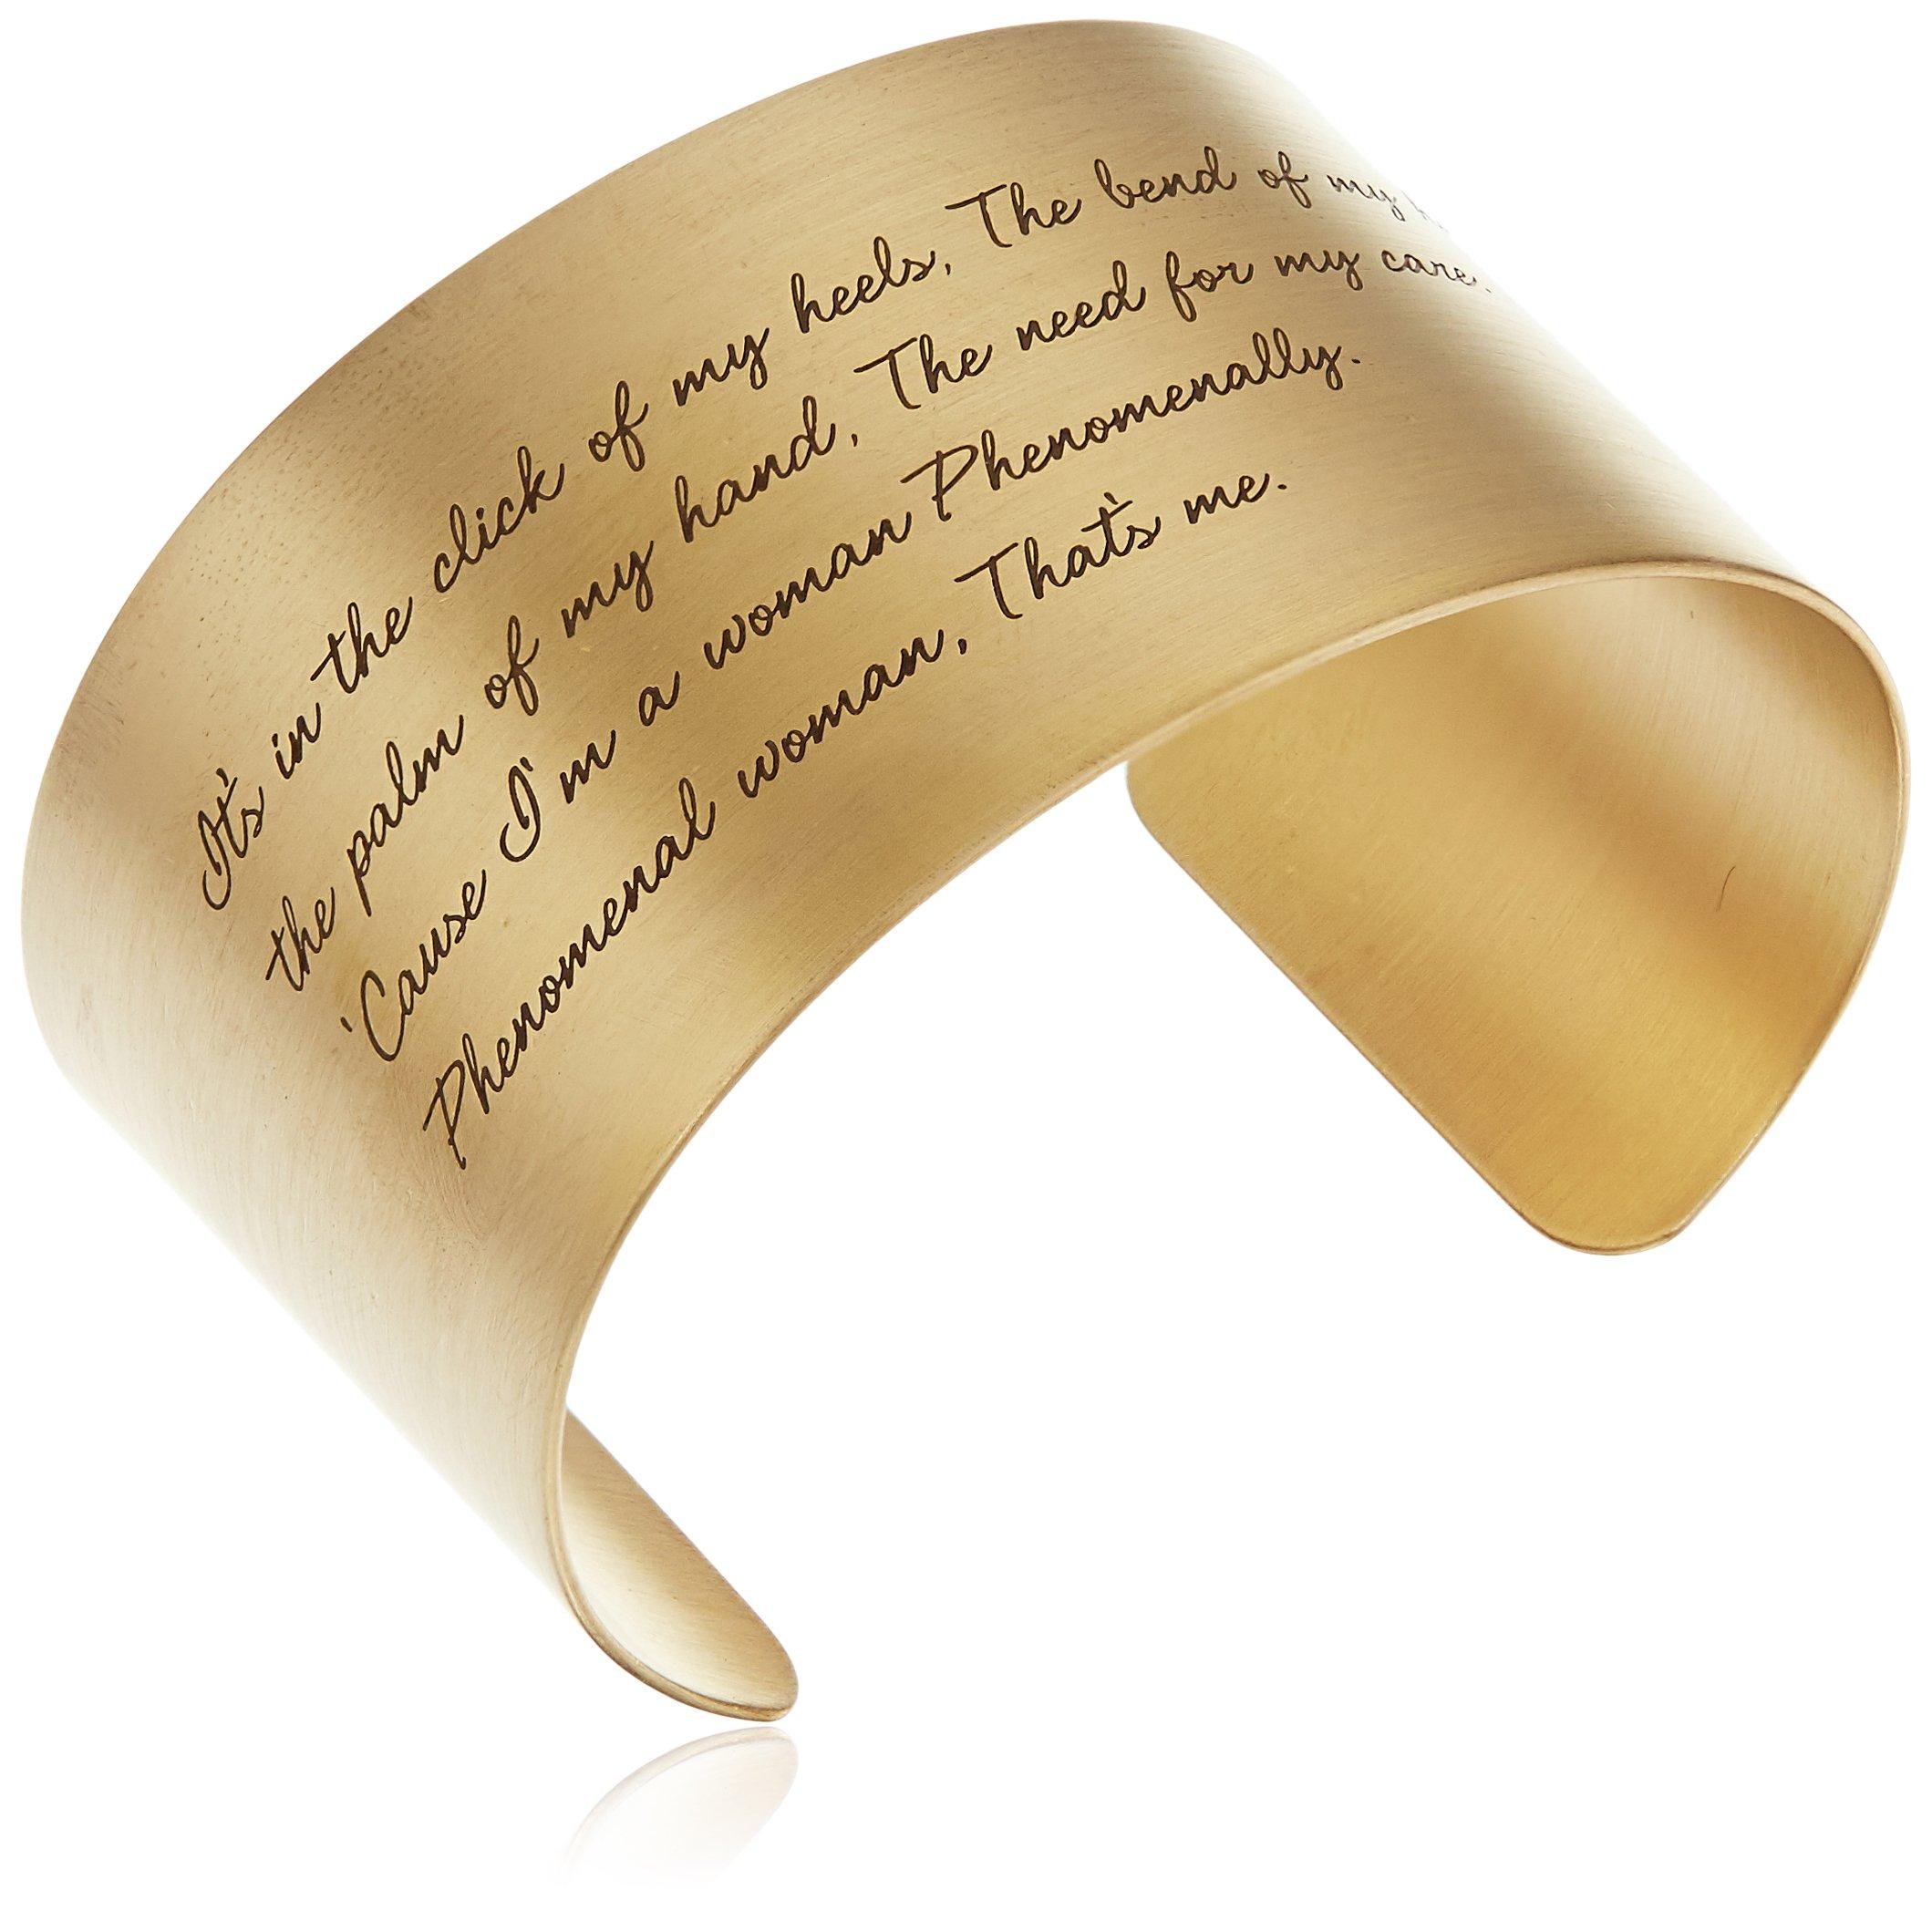 Dogeared ''Maya Angelou'' Phenomenal Woman Large Engraved Gold Cuff Bracelet